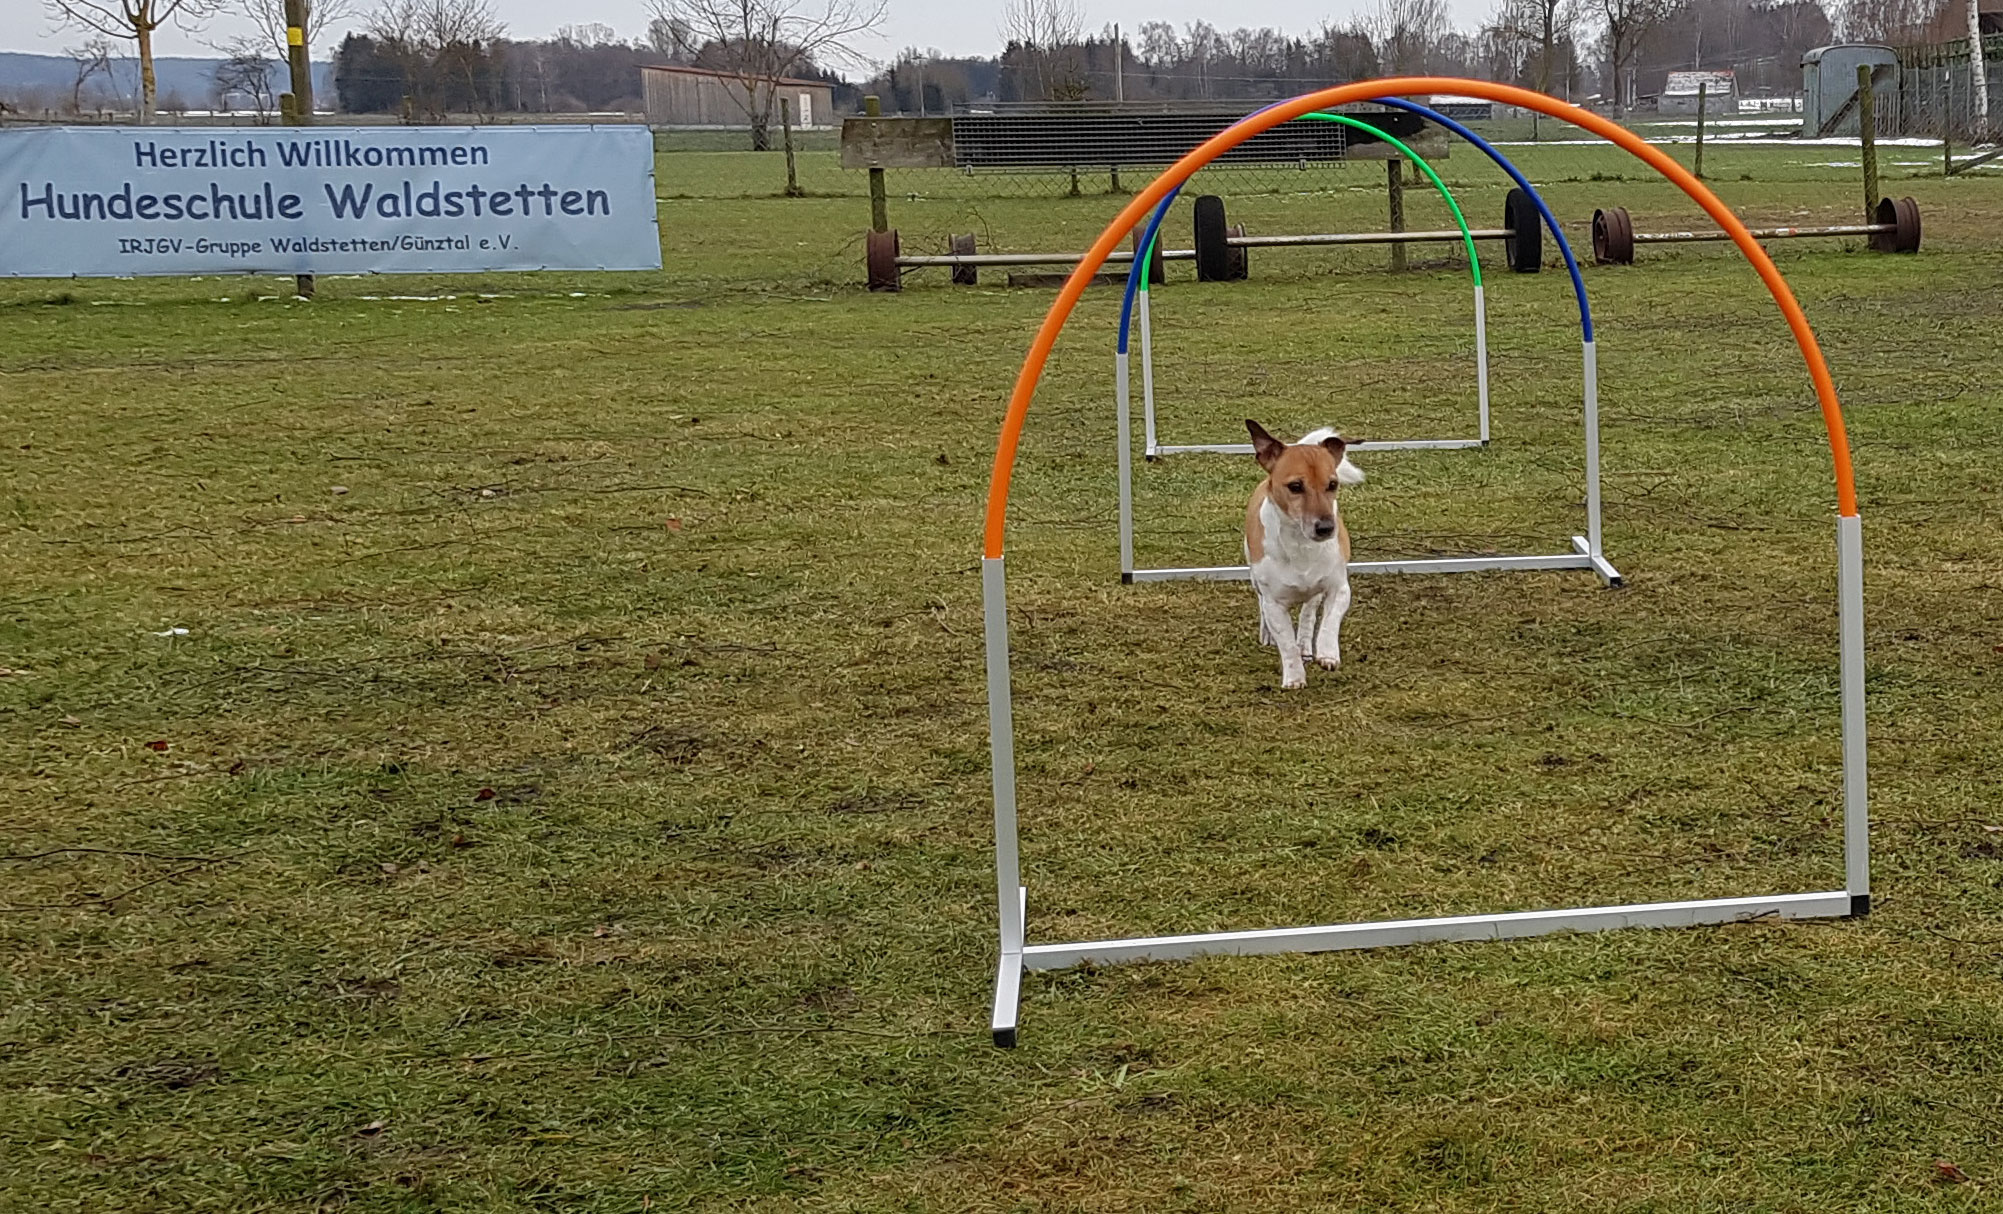 Hoopers Agility bei der Hundeschule Waldstetten Kreis Günzburg